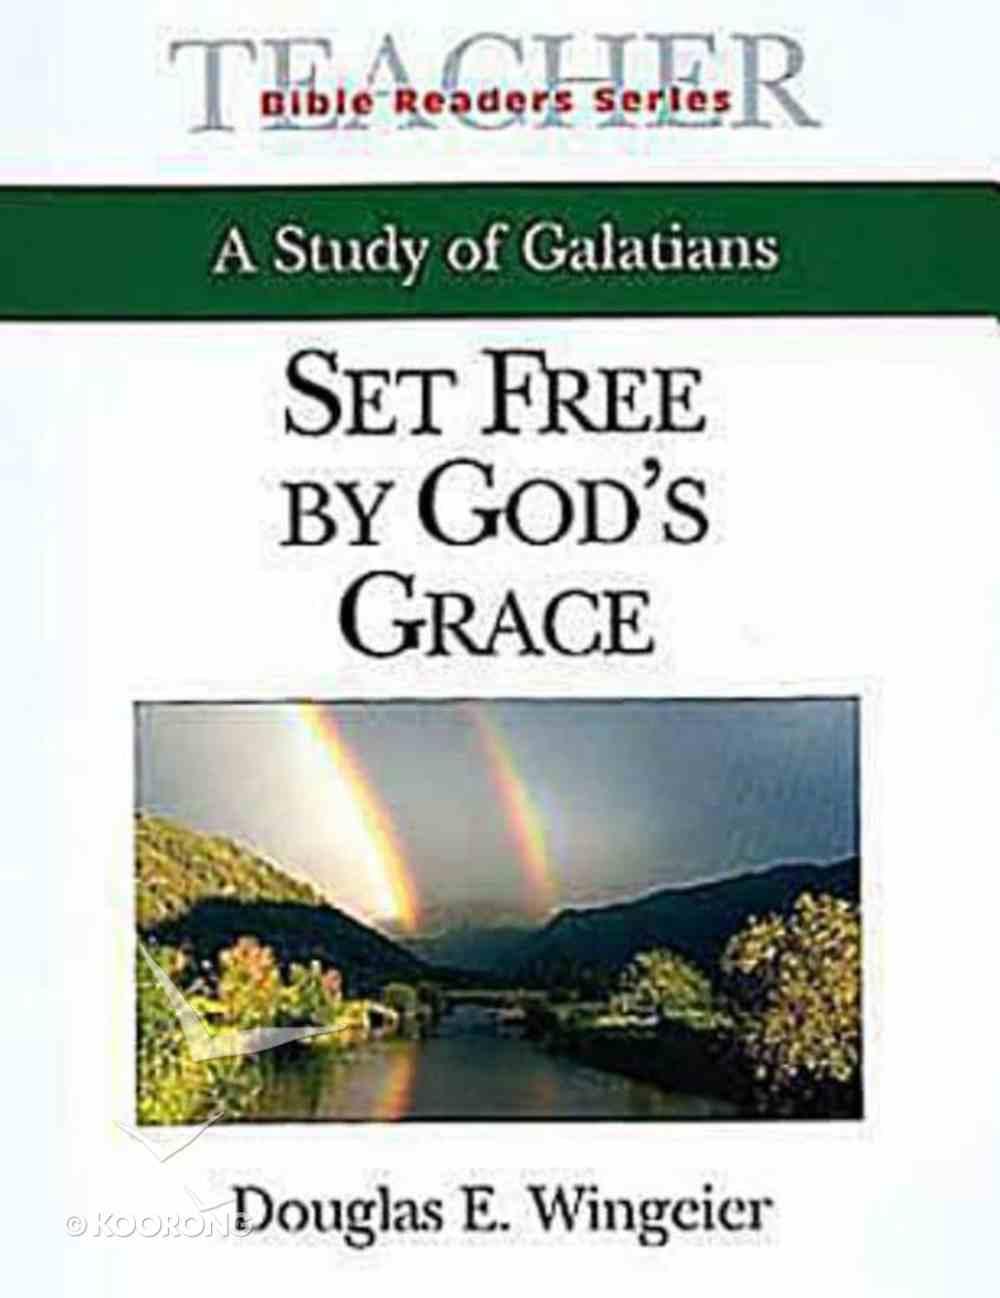 Set Free By God's Grace (Teacher's Guide) (Abingdon Bible Reader Series) Paperback